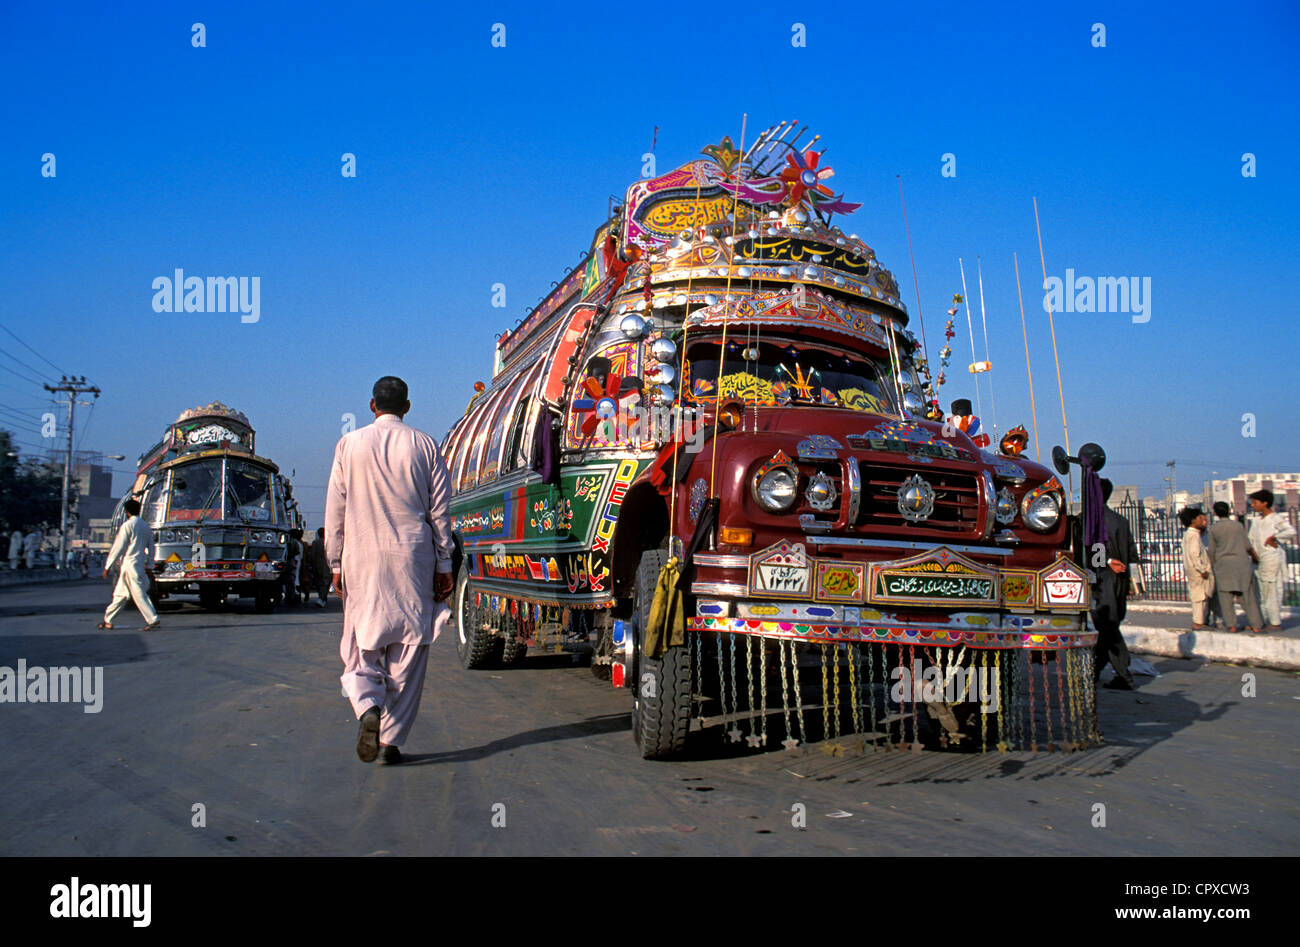 Pakistan, Lahore, Bus line - Stock Image